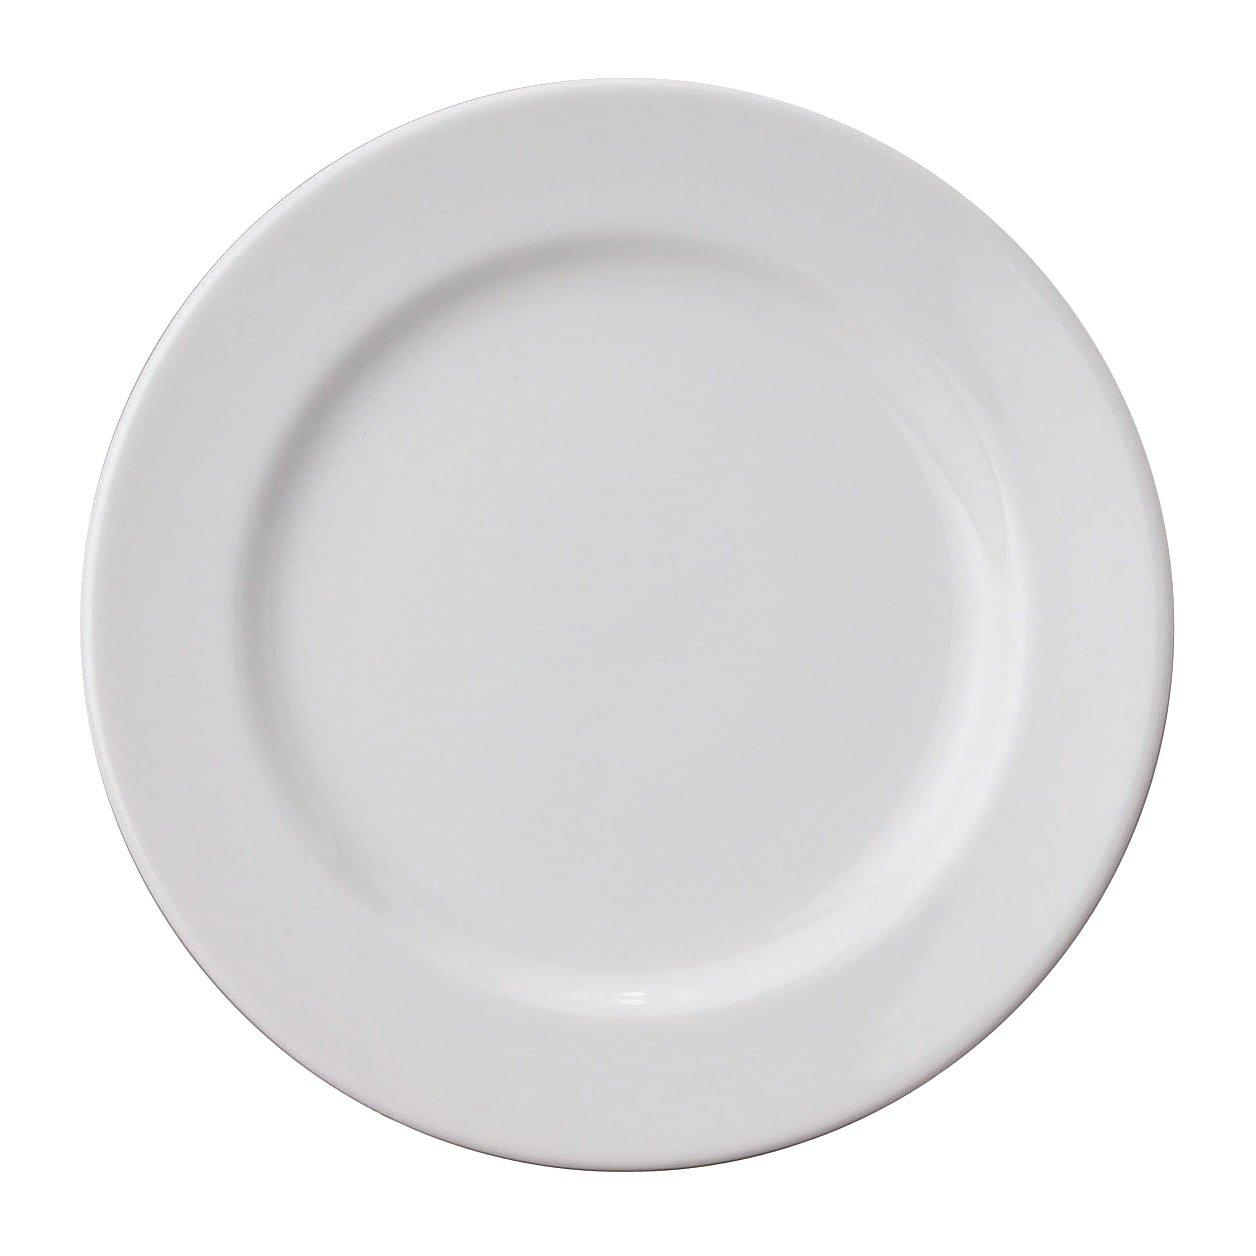 HIC Porcelain Salad Plate 7.5-inch